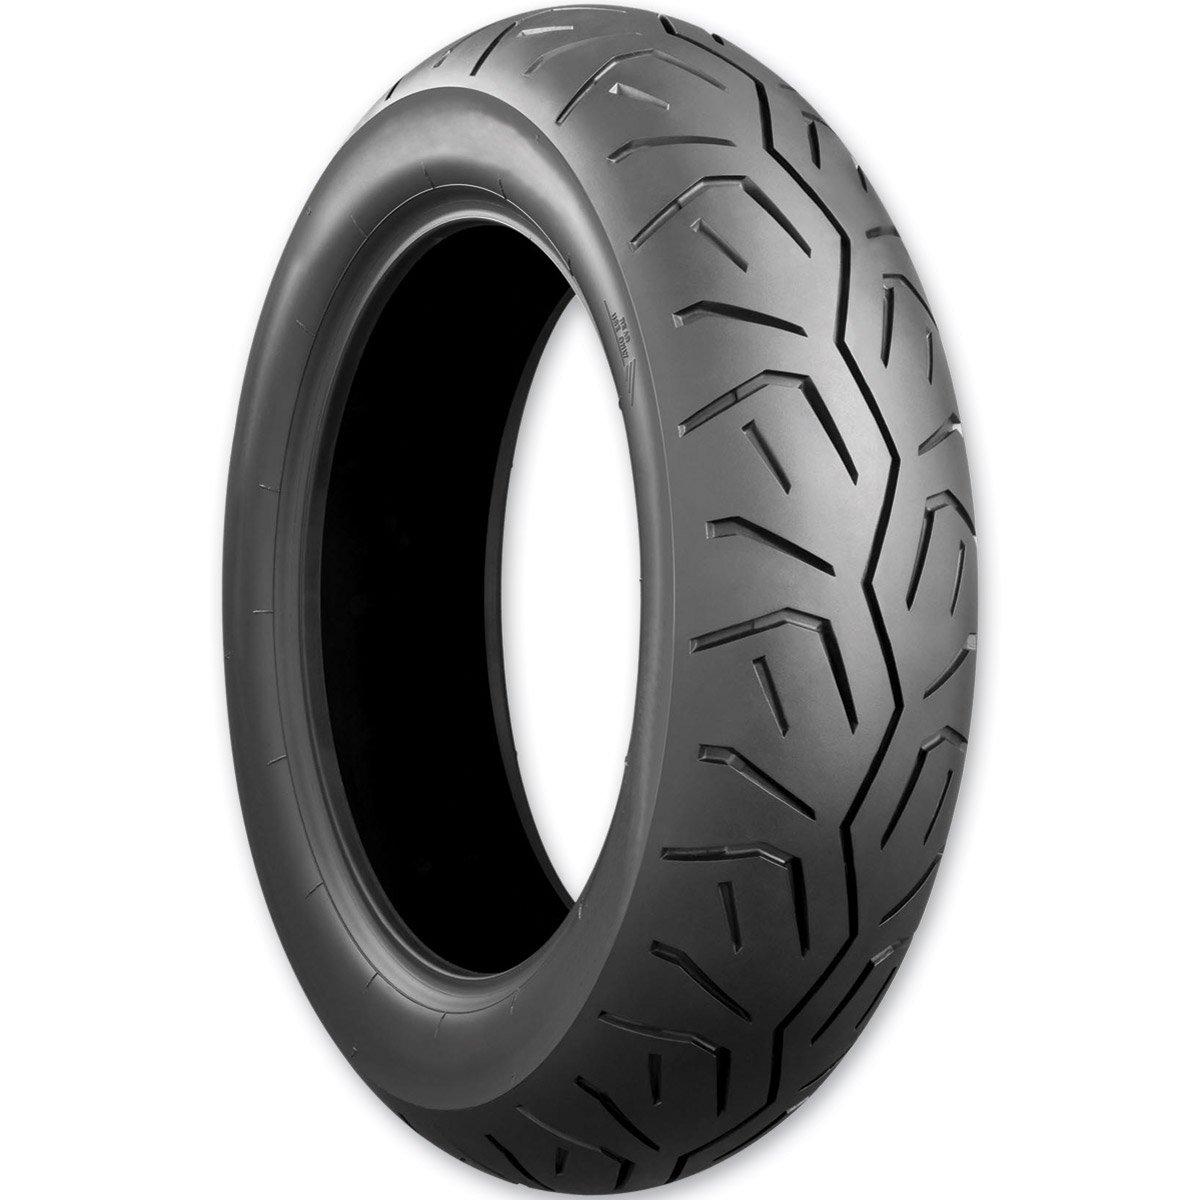 Bridgestone Exedra Max 180/70R16 Rear Tire 4795 4333046923